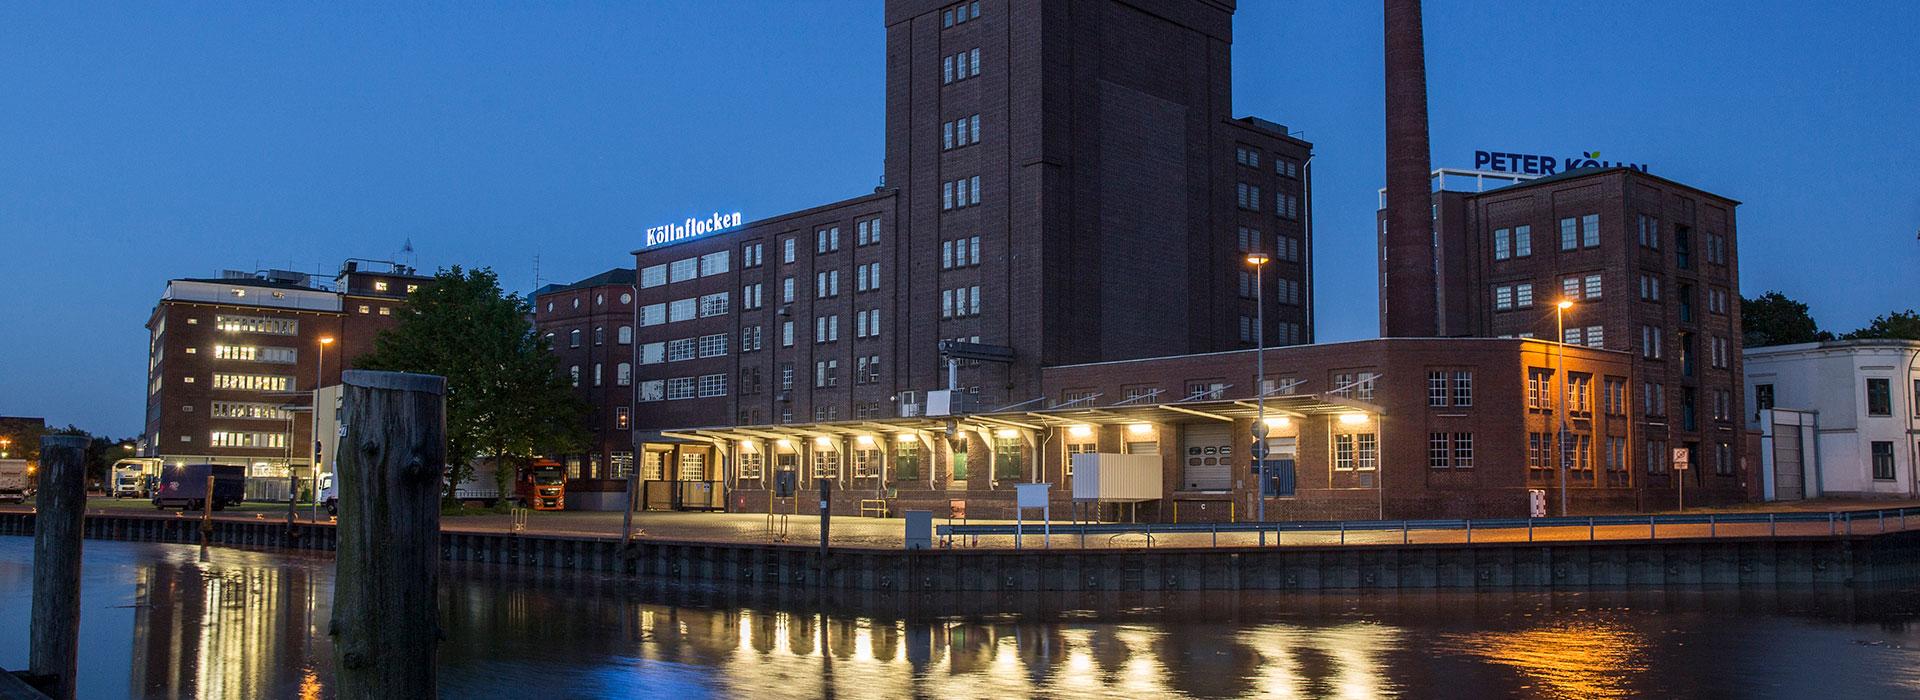 Company Premises Peter Koelln by Night